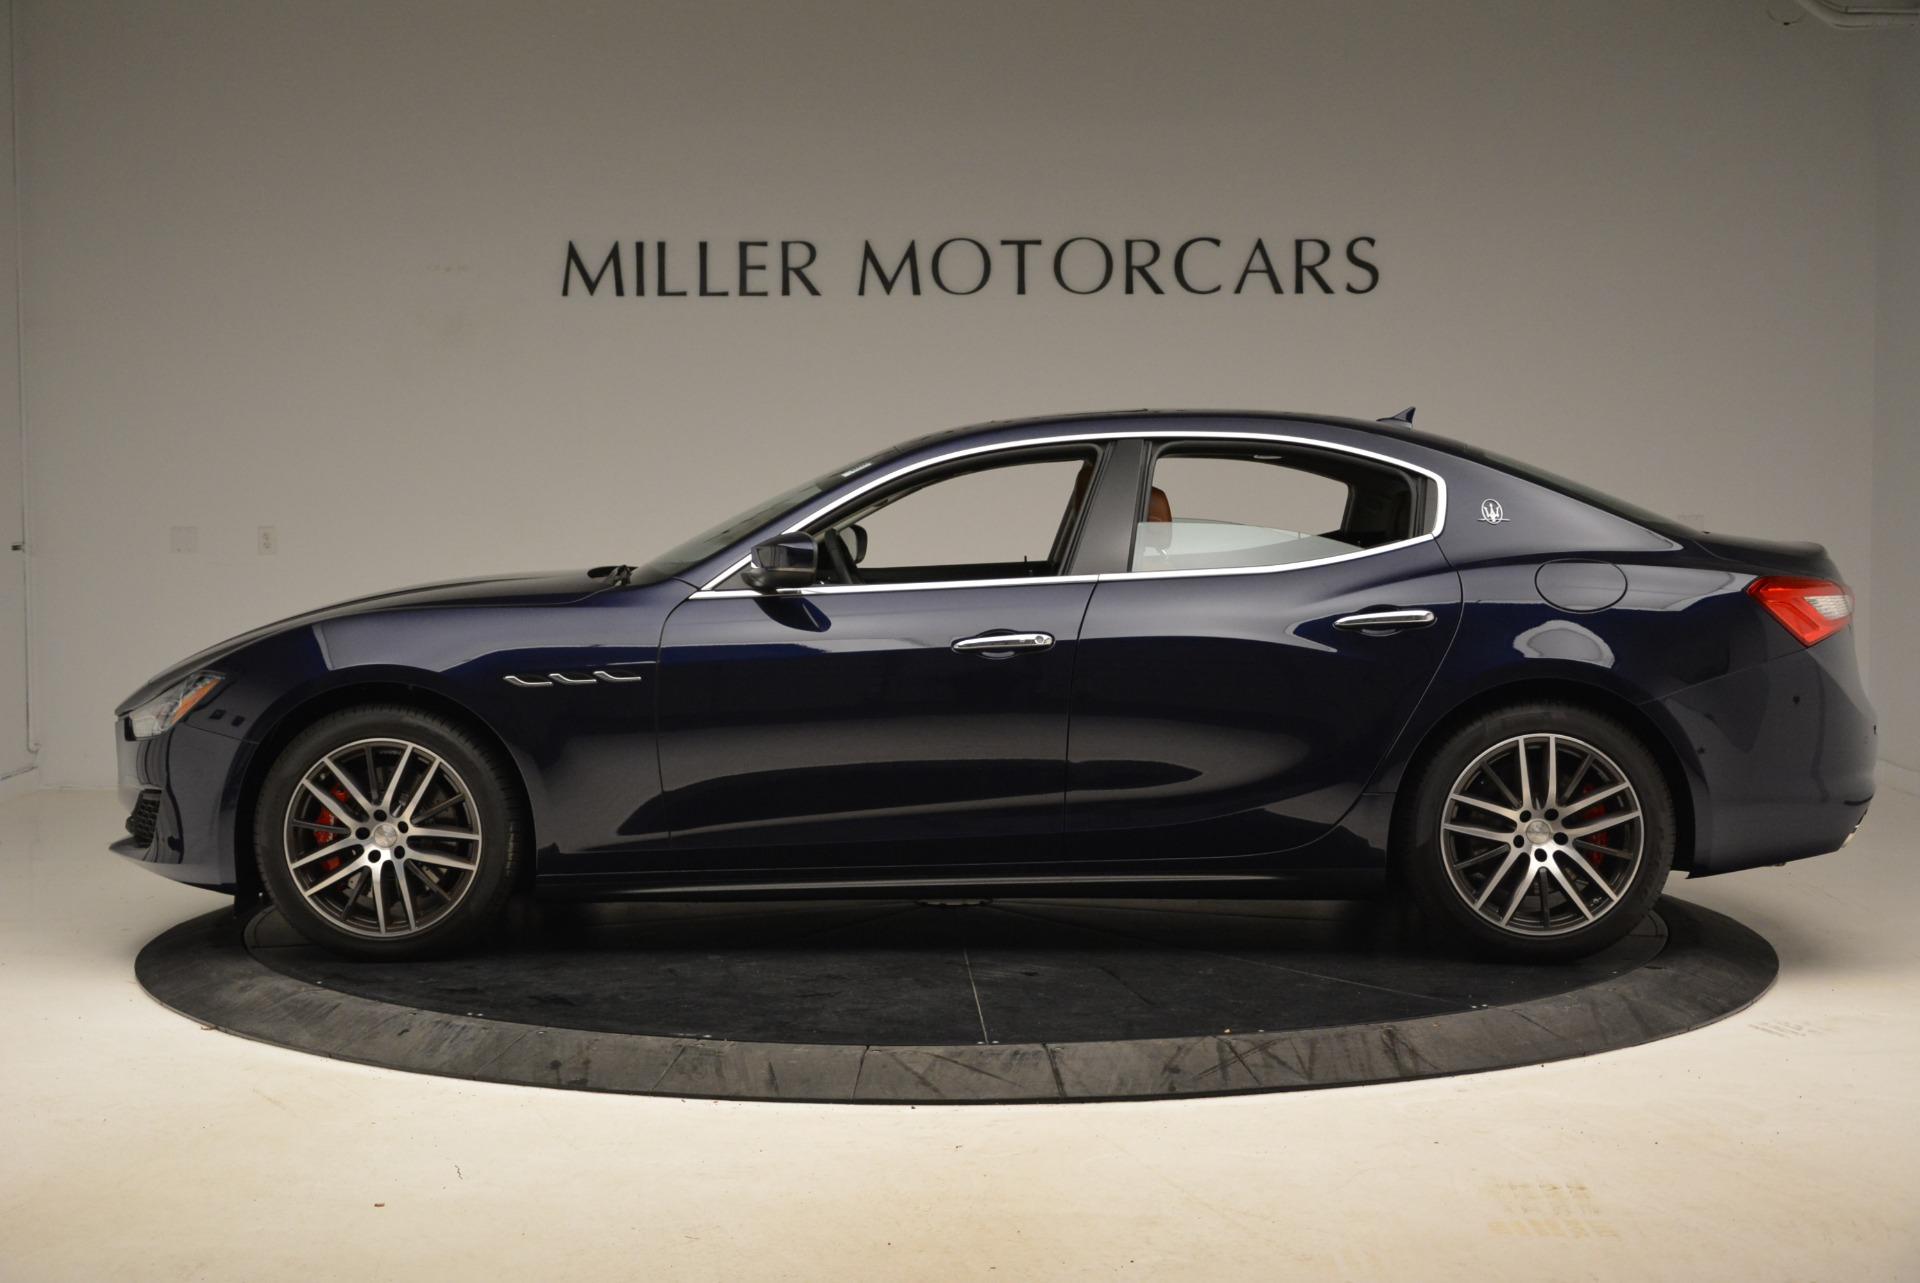 New 2019 Maserati Ghibli S Q4 For Sale In Westport, CT 3018_p3